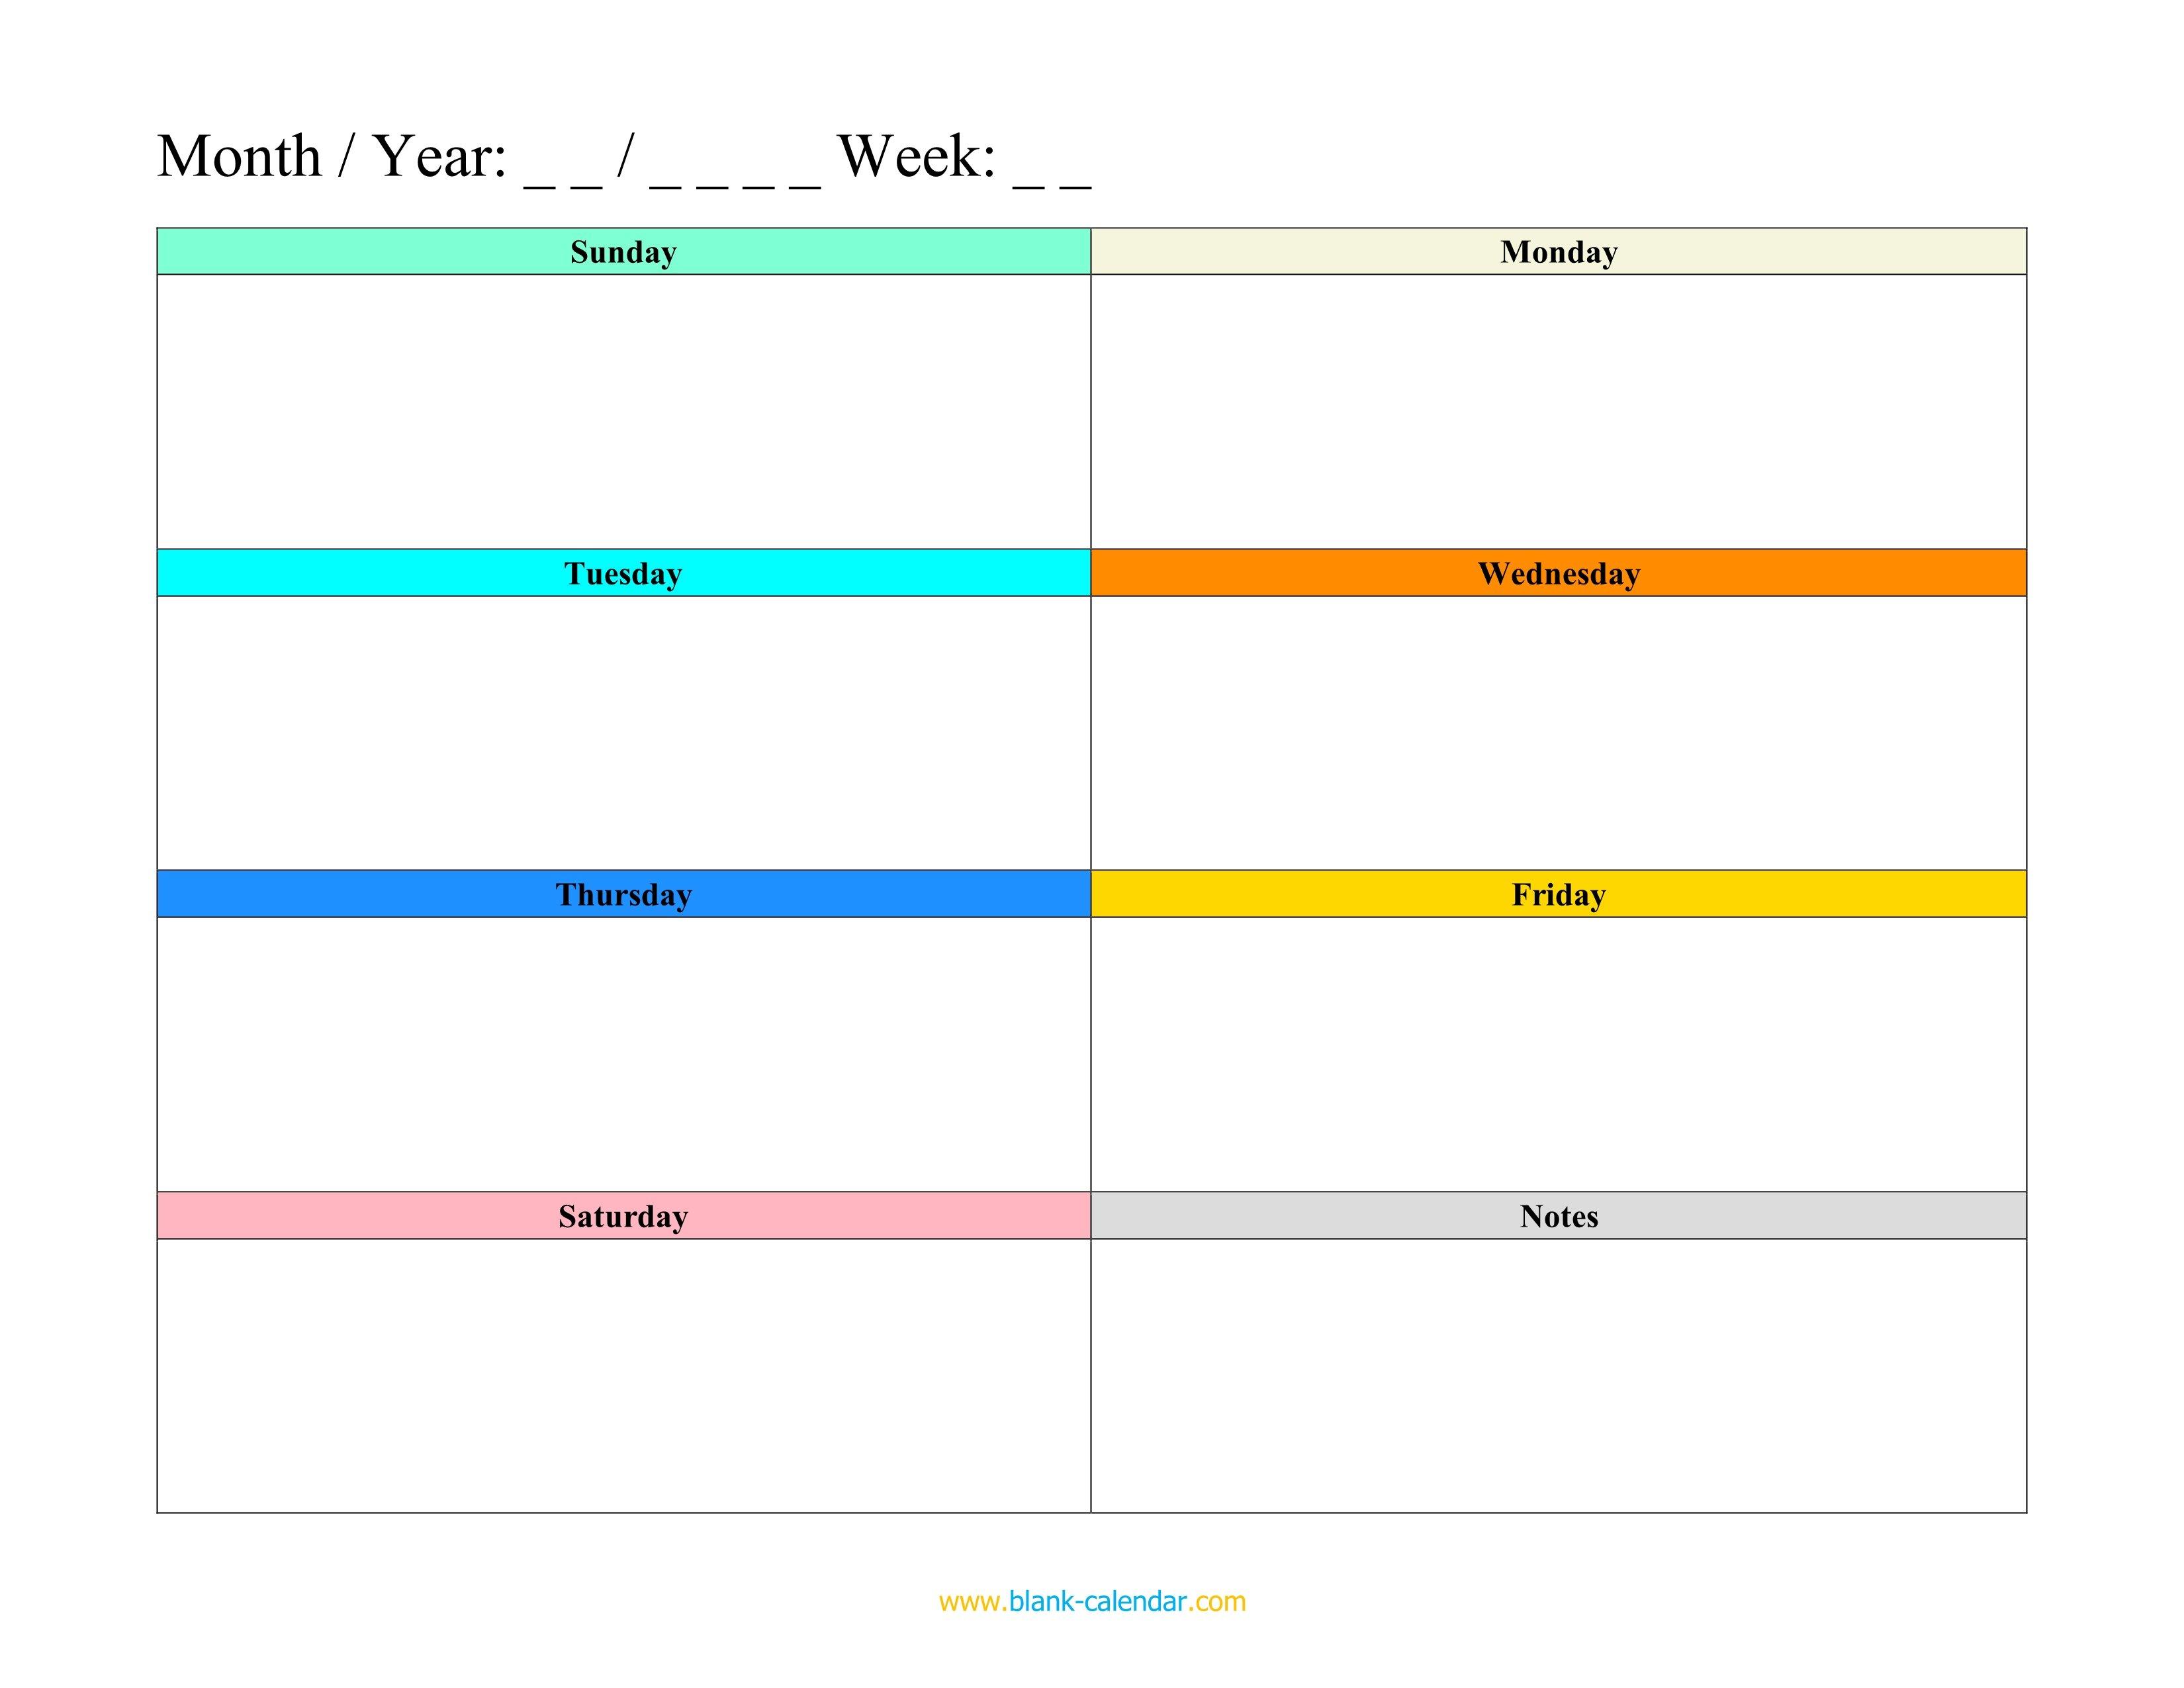 Weekly Schedule Planner Templates (Word, Excel, Pdf) Free Fillable Weekly Schedule Templates